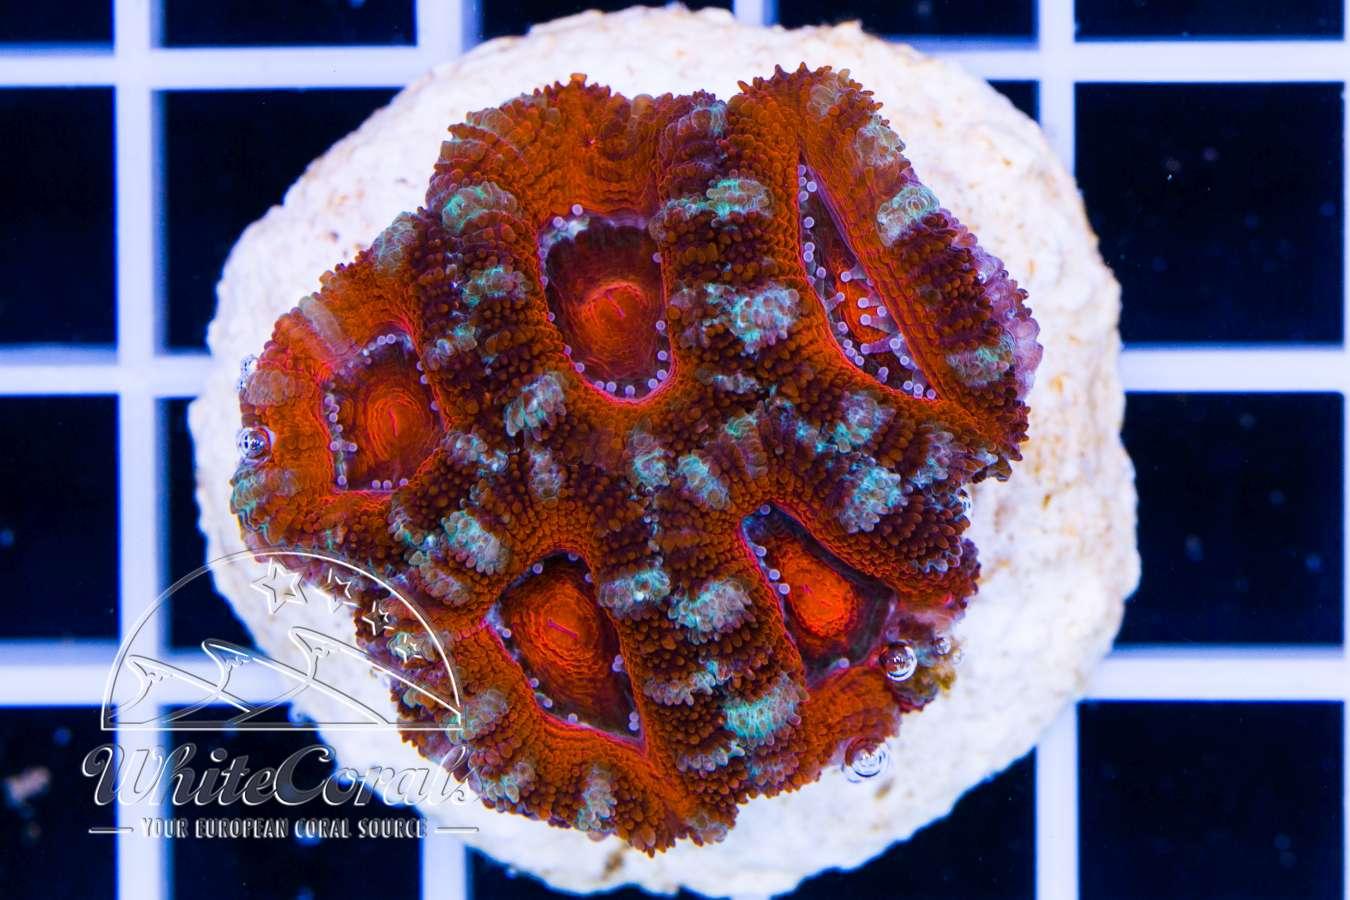 acanthastrea korallen ableger online kaufen meerwassershop. Black Bedroom Furniture Sets. Home Design Ideas